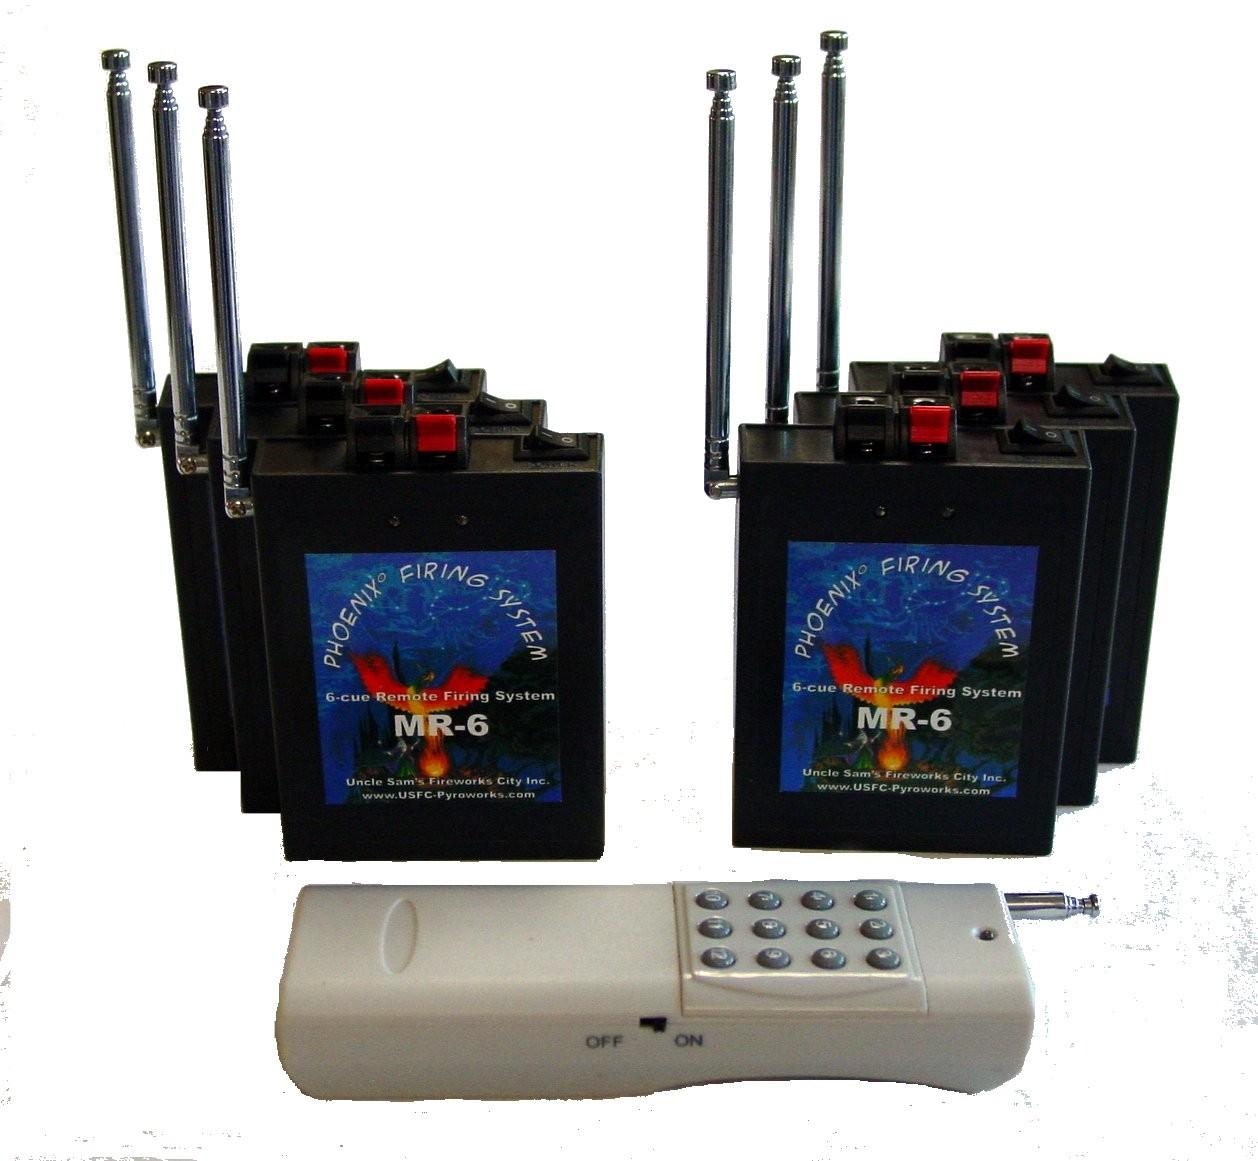 Phoenix MR-6 Multi-Receiver Firing System - FCC CERTIFIED